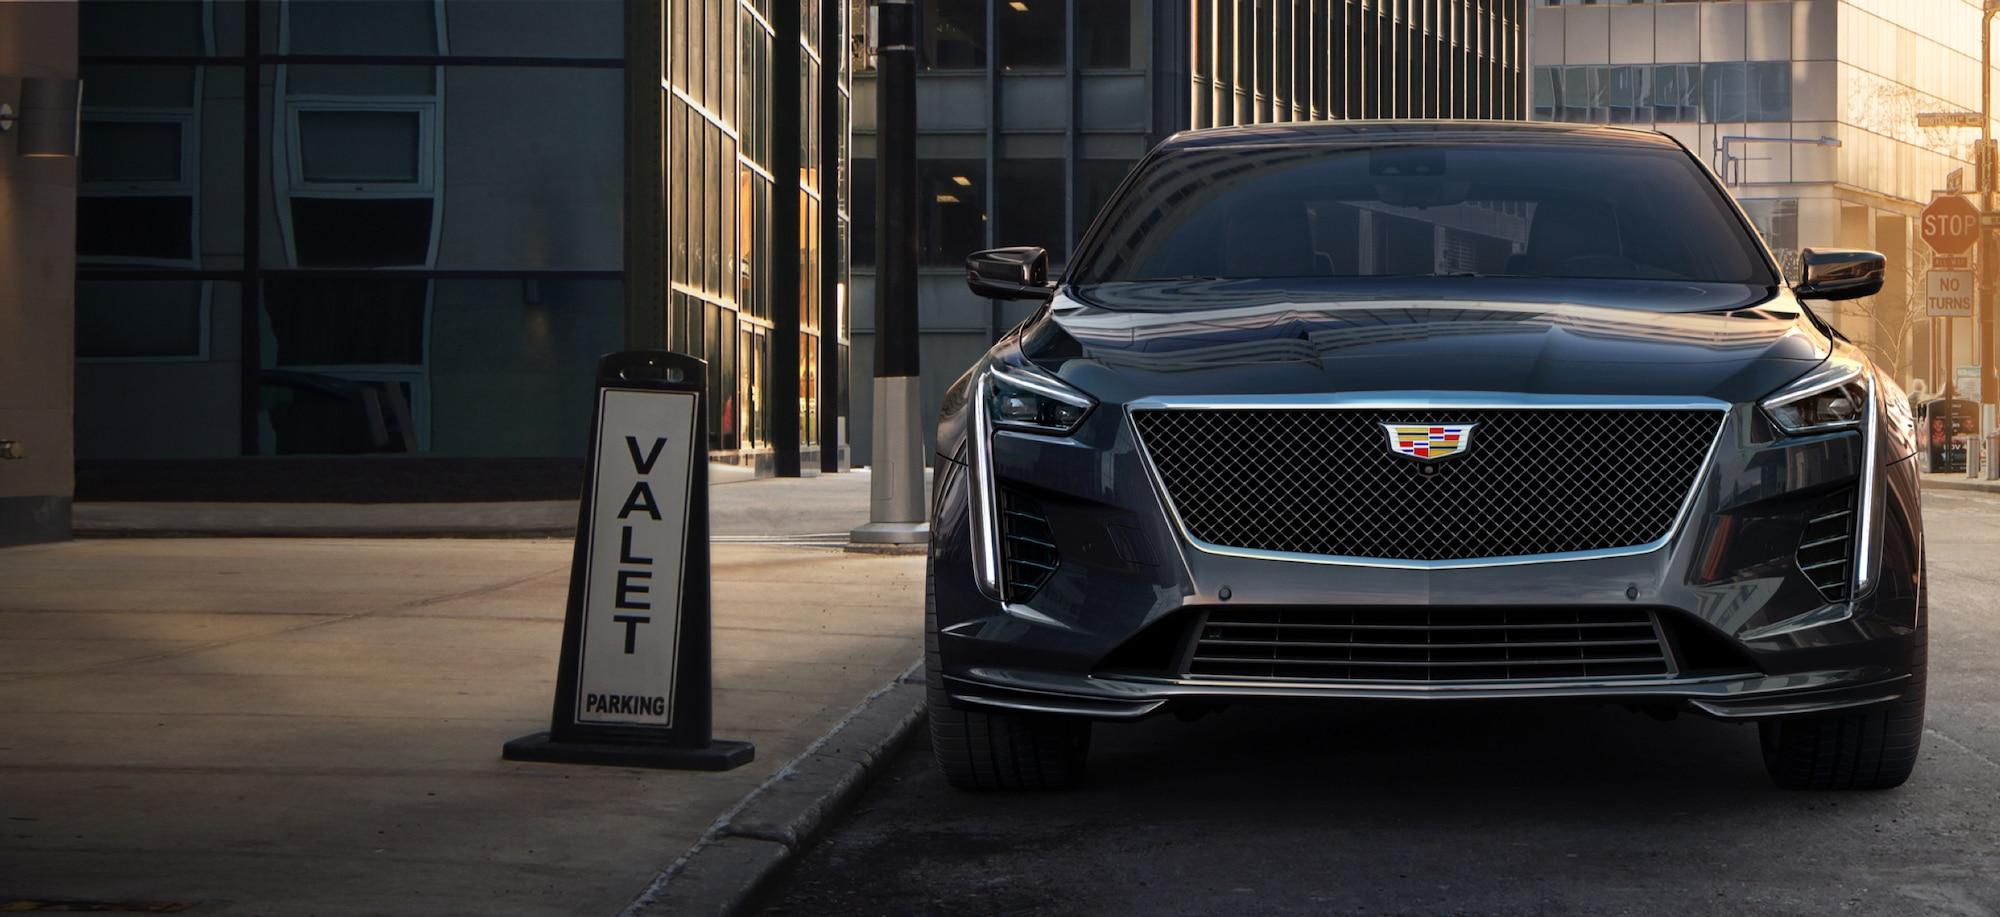 cadillac prestige cars suvs sedans coupes crossovers rh cadillac com 2018 Cadillac CTS V 2018 Cadillac Fleetwood